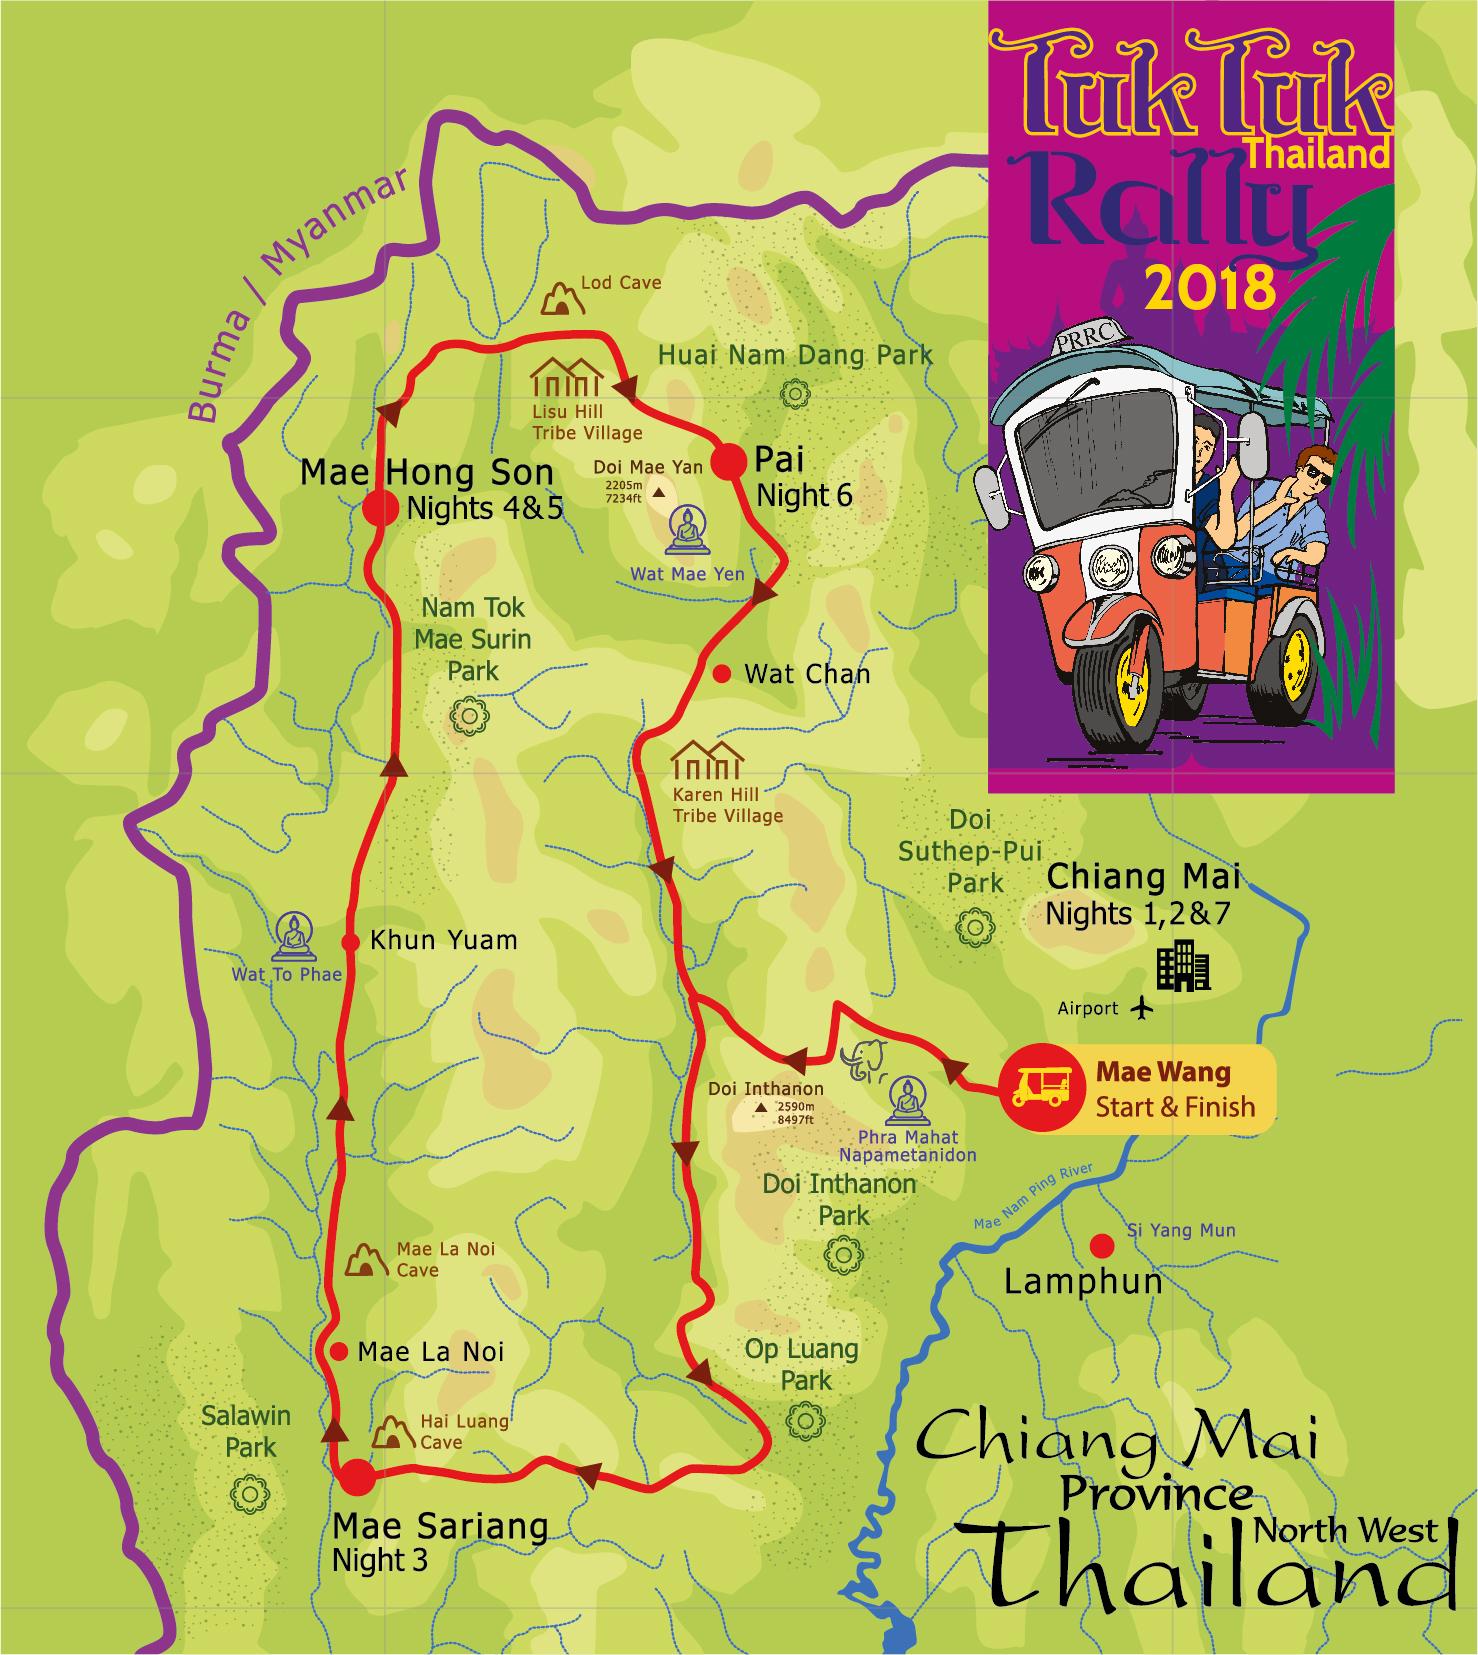 Tuk Tuk Rally Logo Map Illustration